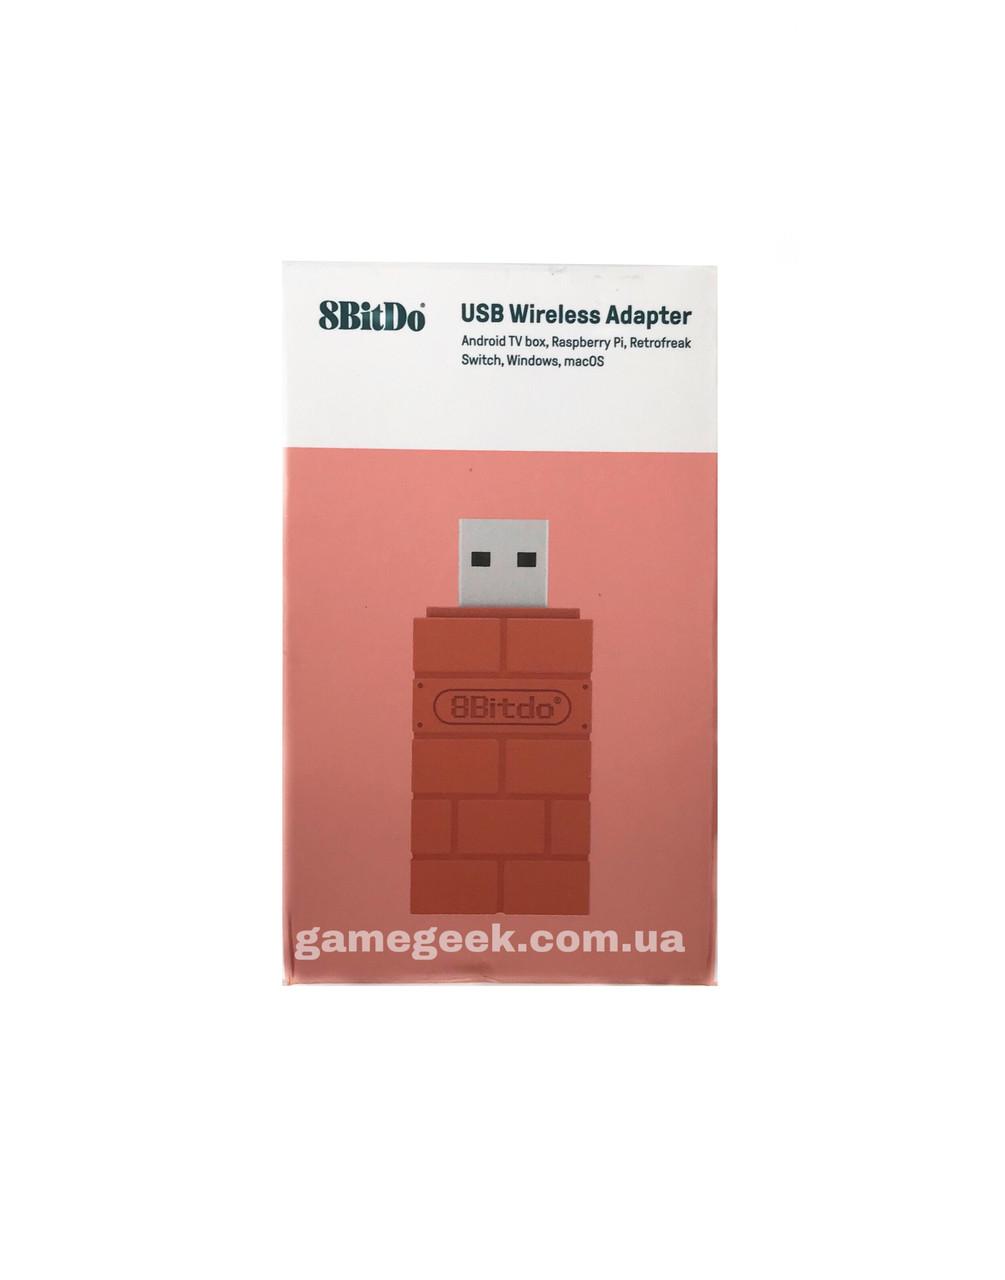 8BitDo Беспроводной адаптер Bluetooth для Nintendo Switch, Windows, Mac, Android TV box, PS и Raspberry Pi